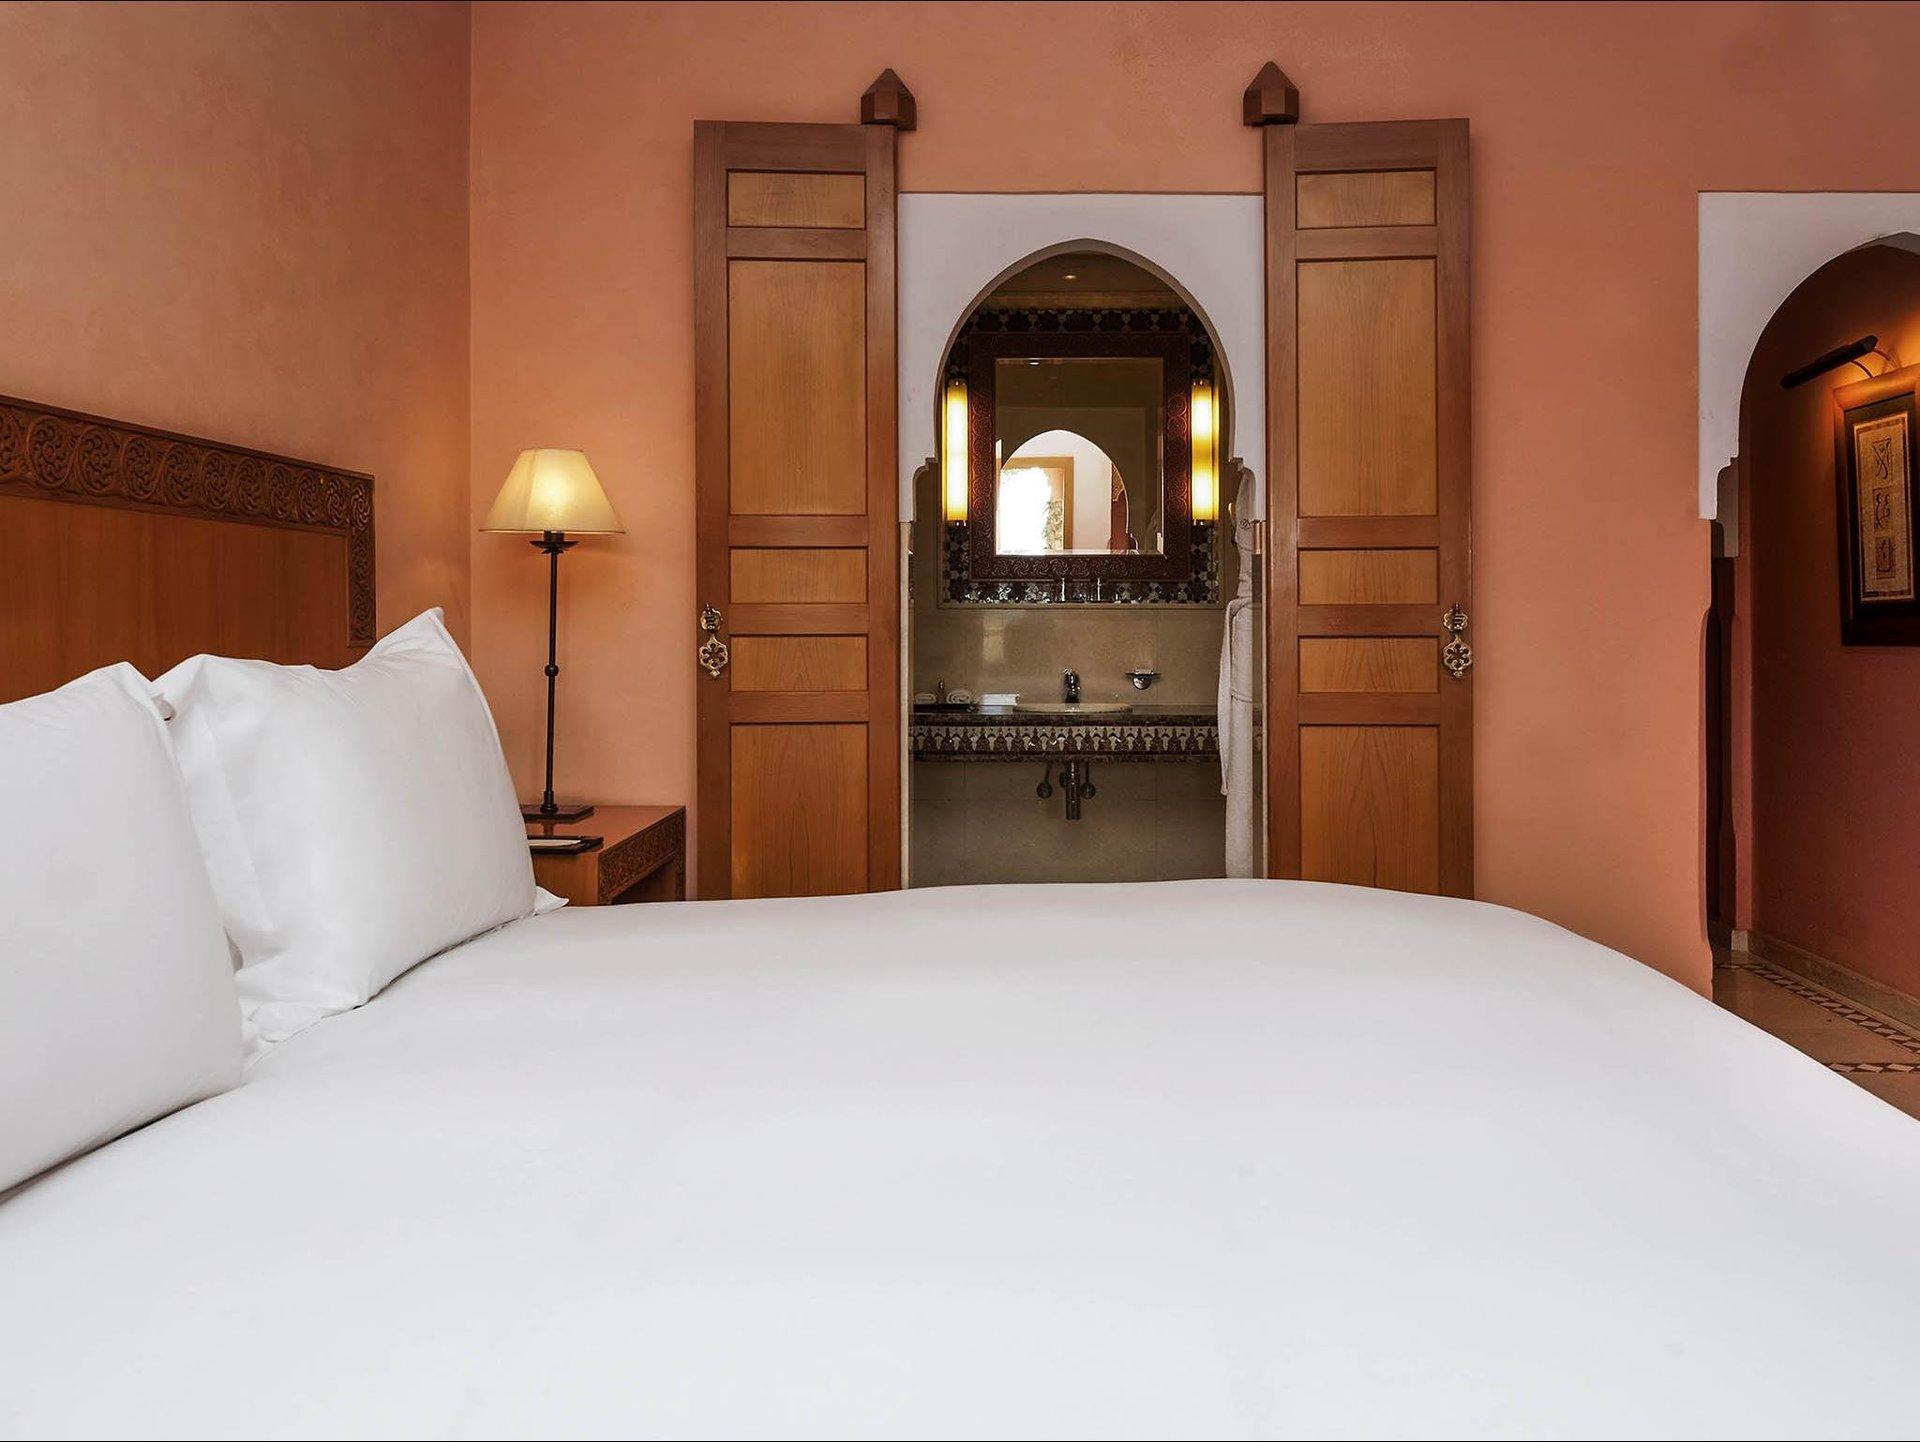 Hotel Sofitel Palais Imperial luxe kamer - Marrakech